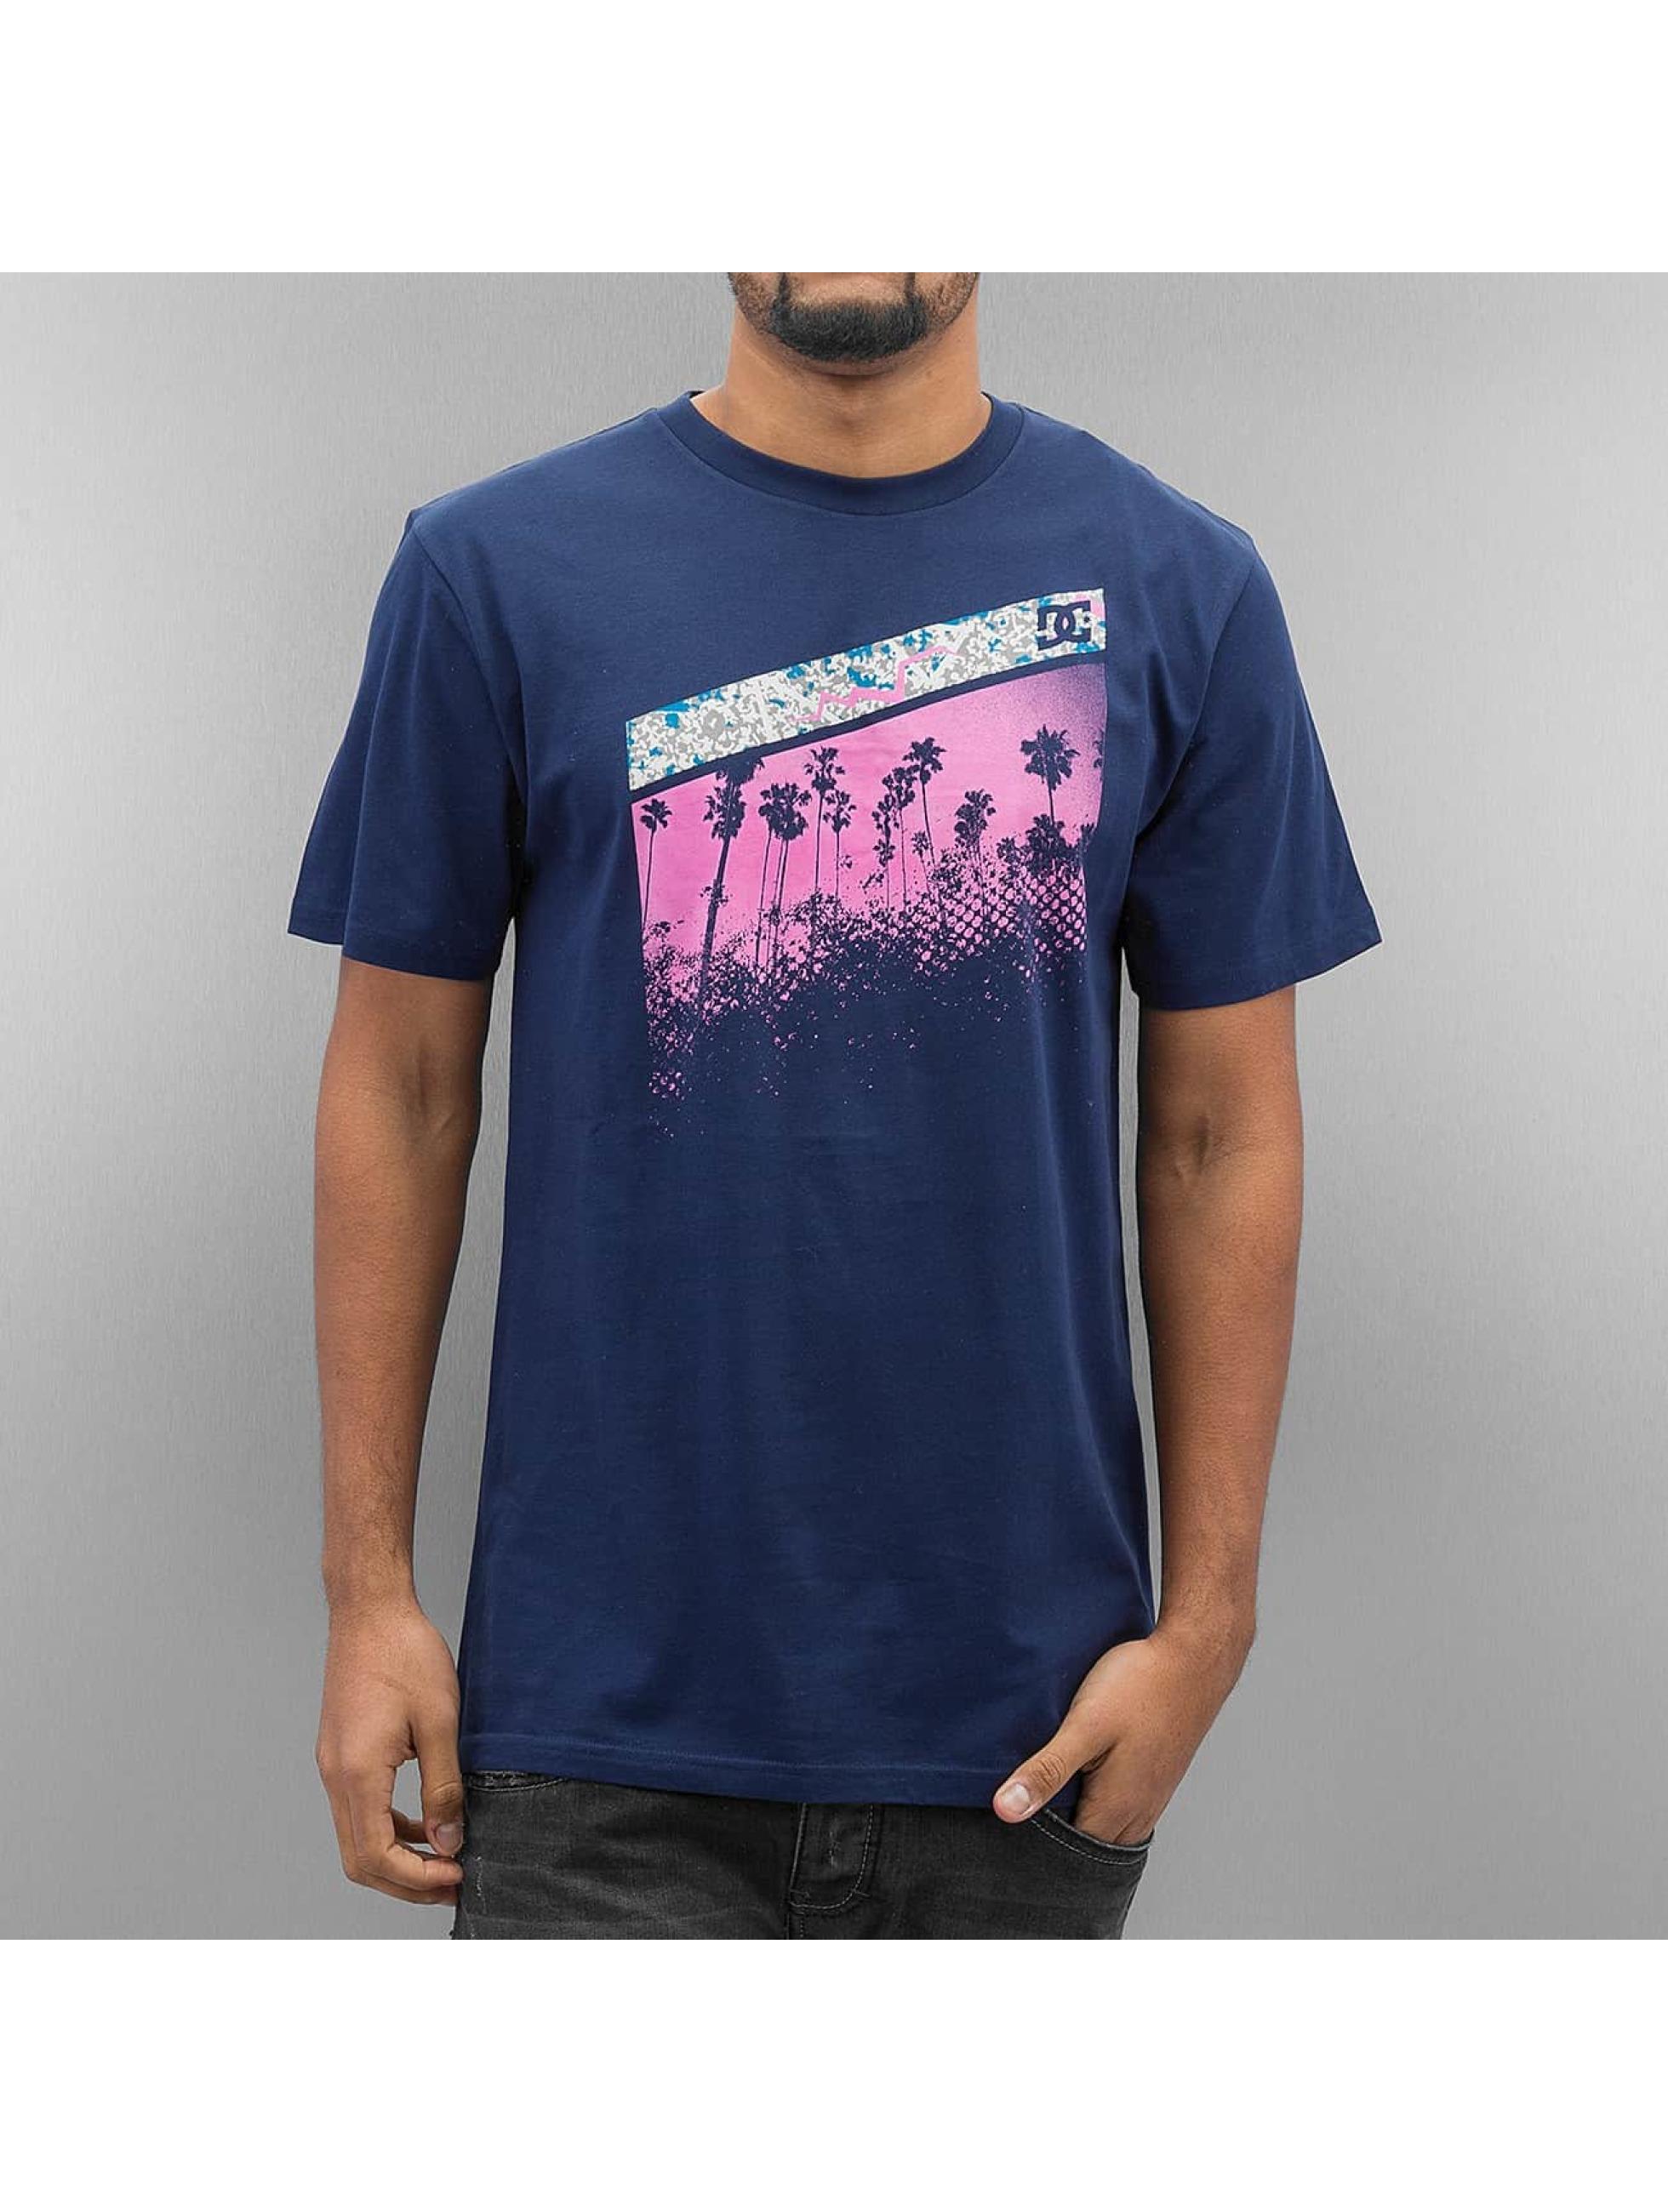 DC-Uomini-Maglieria-T-shirt-Assault-blu-301994-M